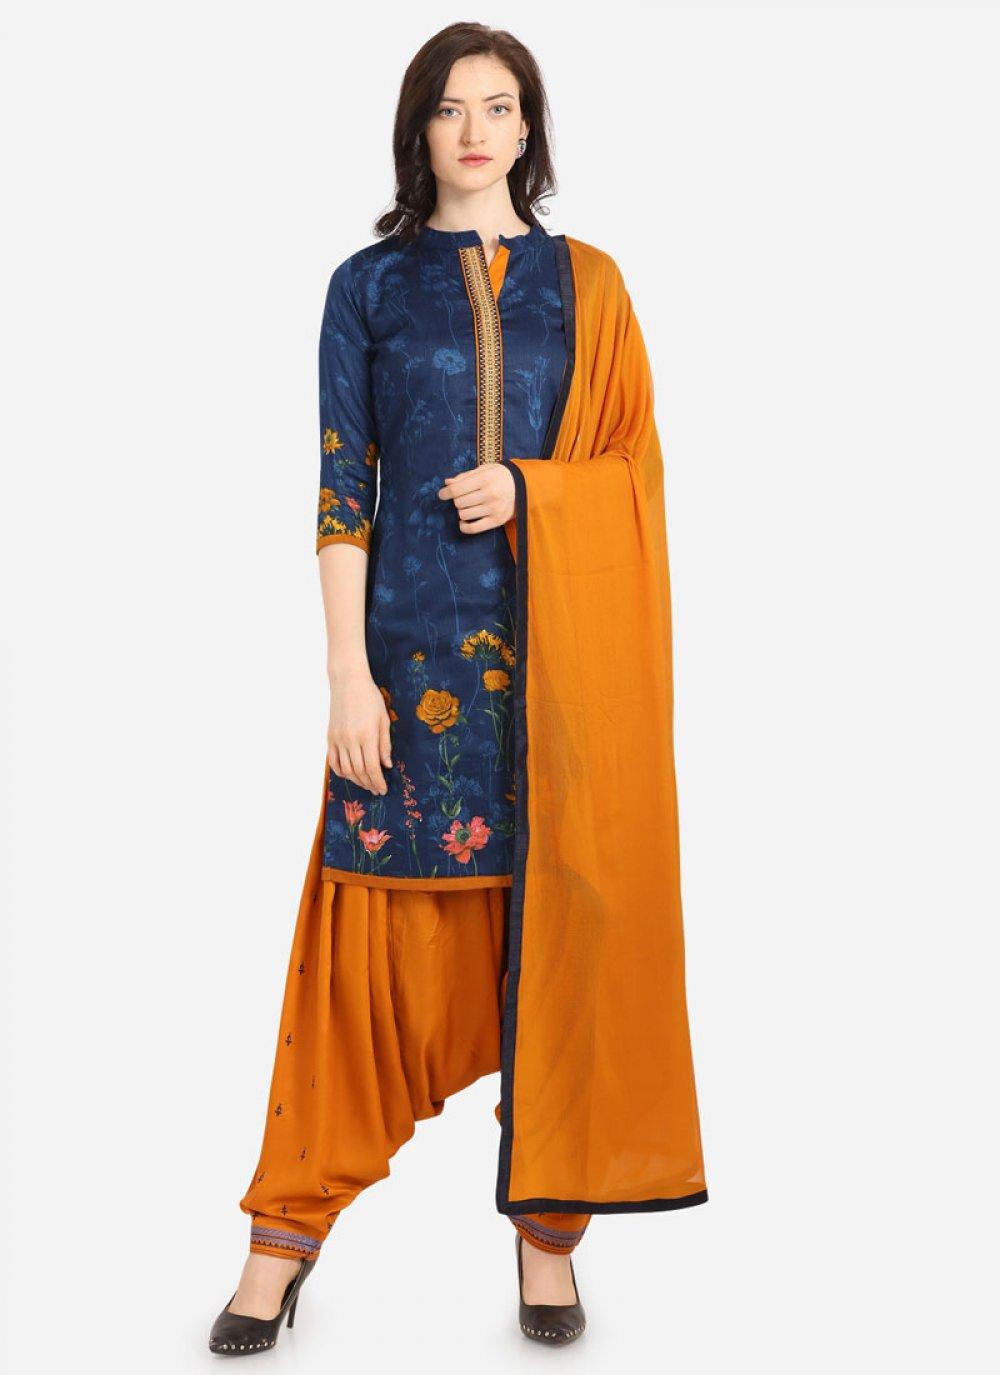 Cotton Digital Print Patiala Salwar Kameez in Blue